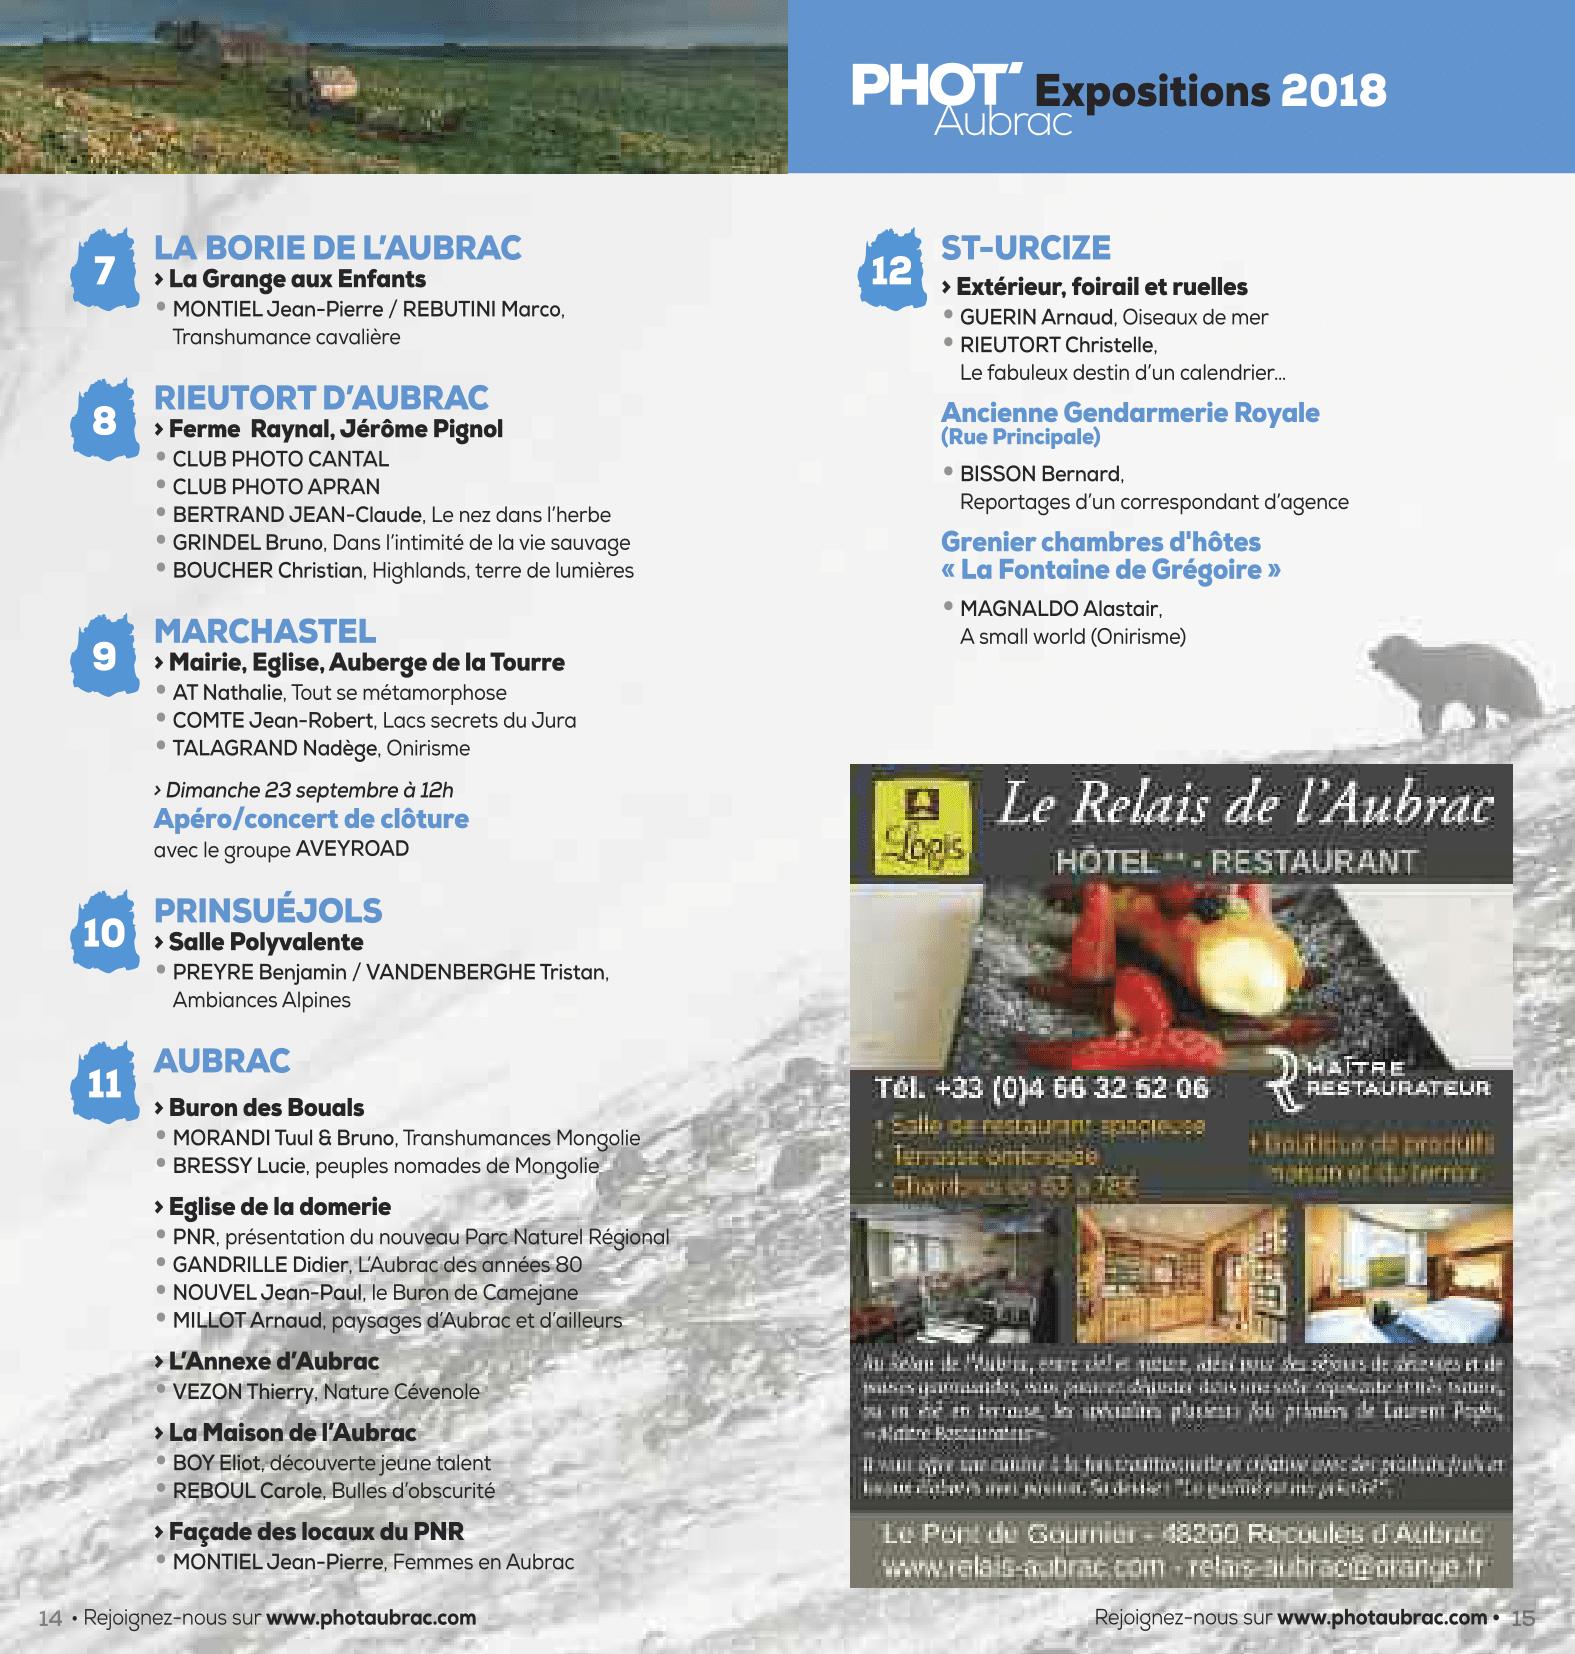 Prog PhotAubrac 2018-net-08.png